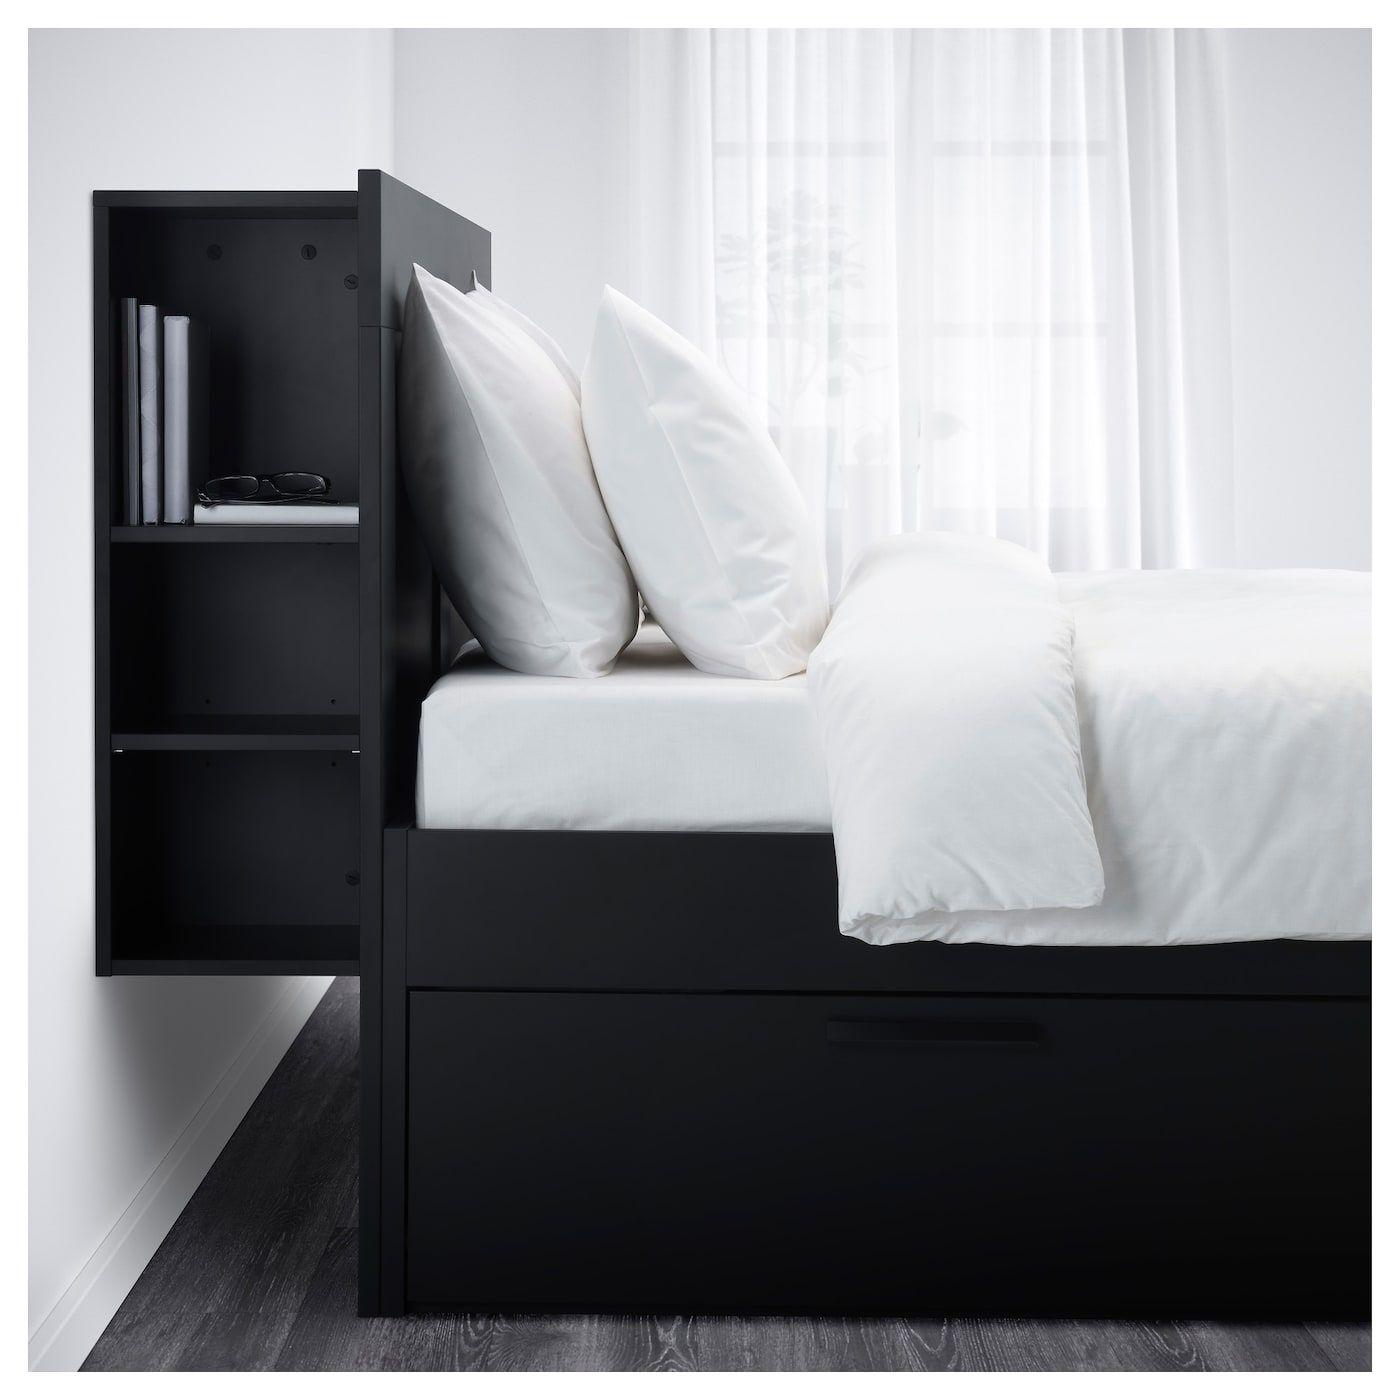 Brimnes Bed Frame With Storage Headboard Black Luroy Queen Headboard Storage Bed Frame With Storage Brimnes Bed